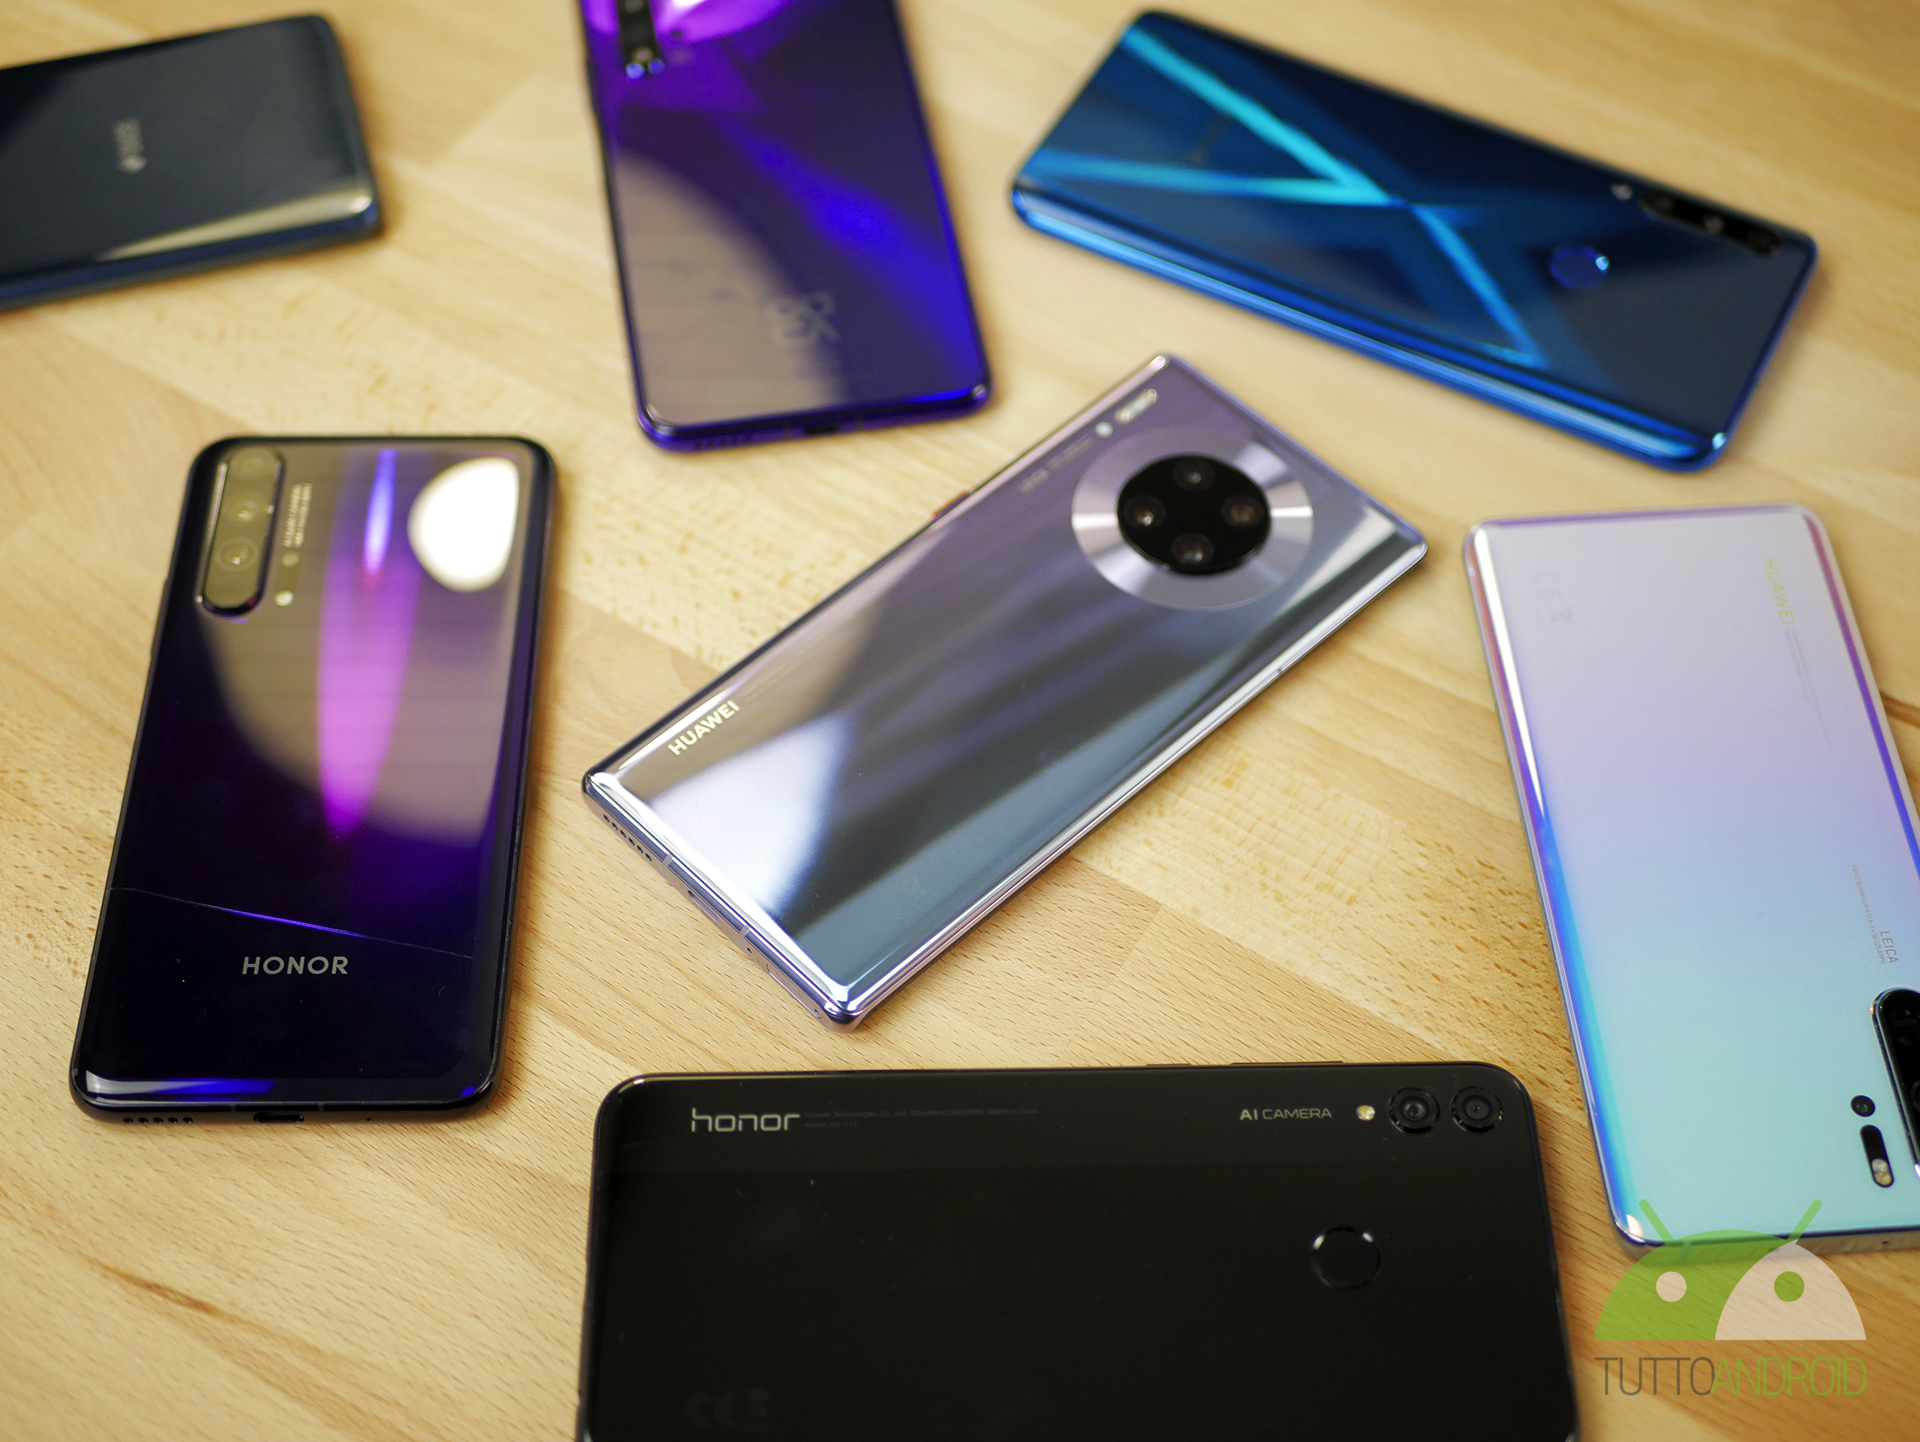 EMUI 10.1 raggiunge altri 36 dispositivi Huawei e HONOR, per